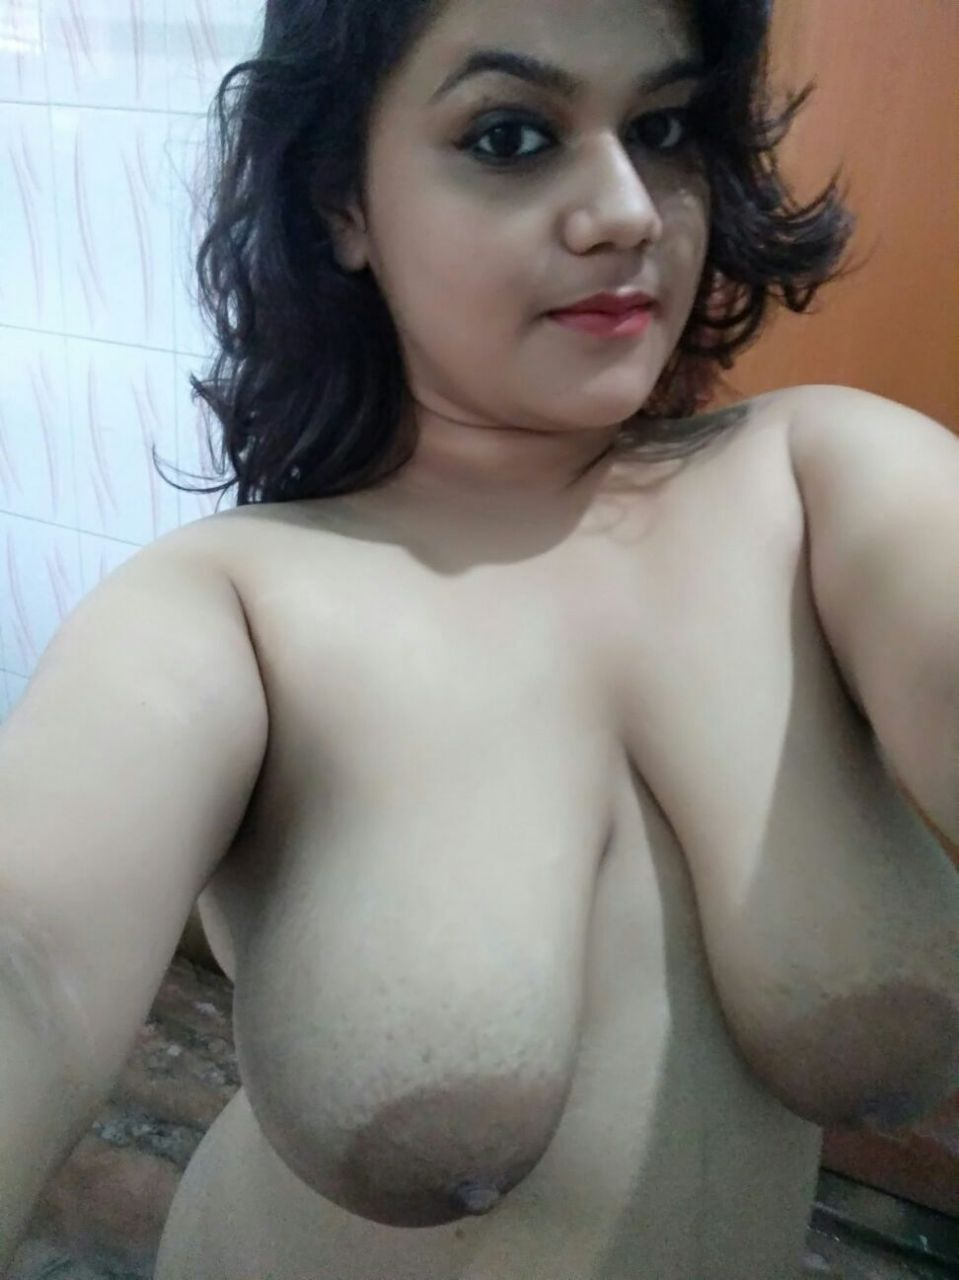 Bangladeshi dhaka banani rebeka shows big boobs on selfie